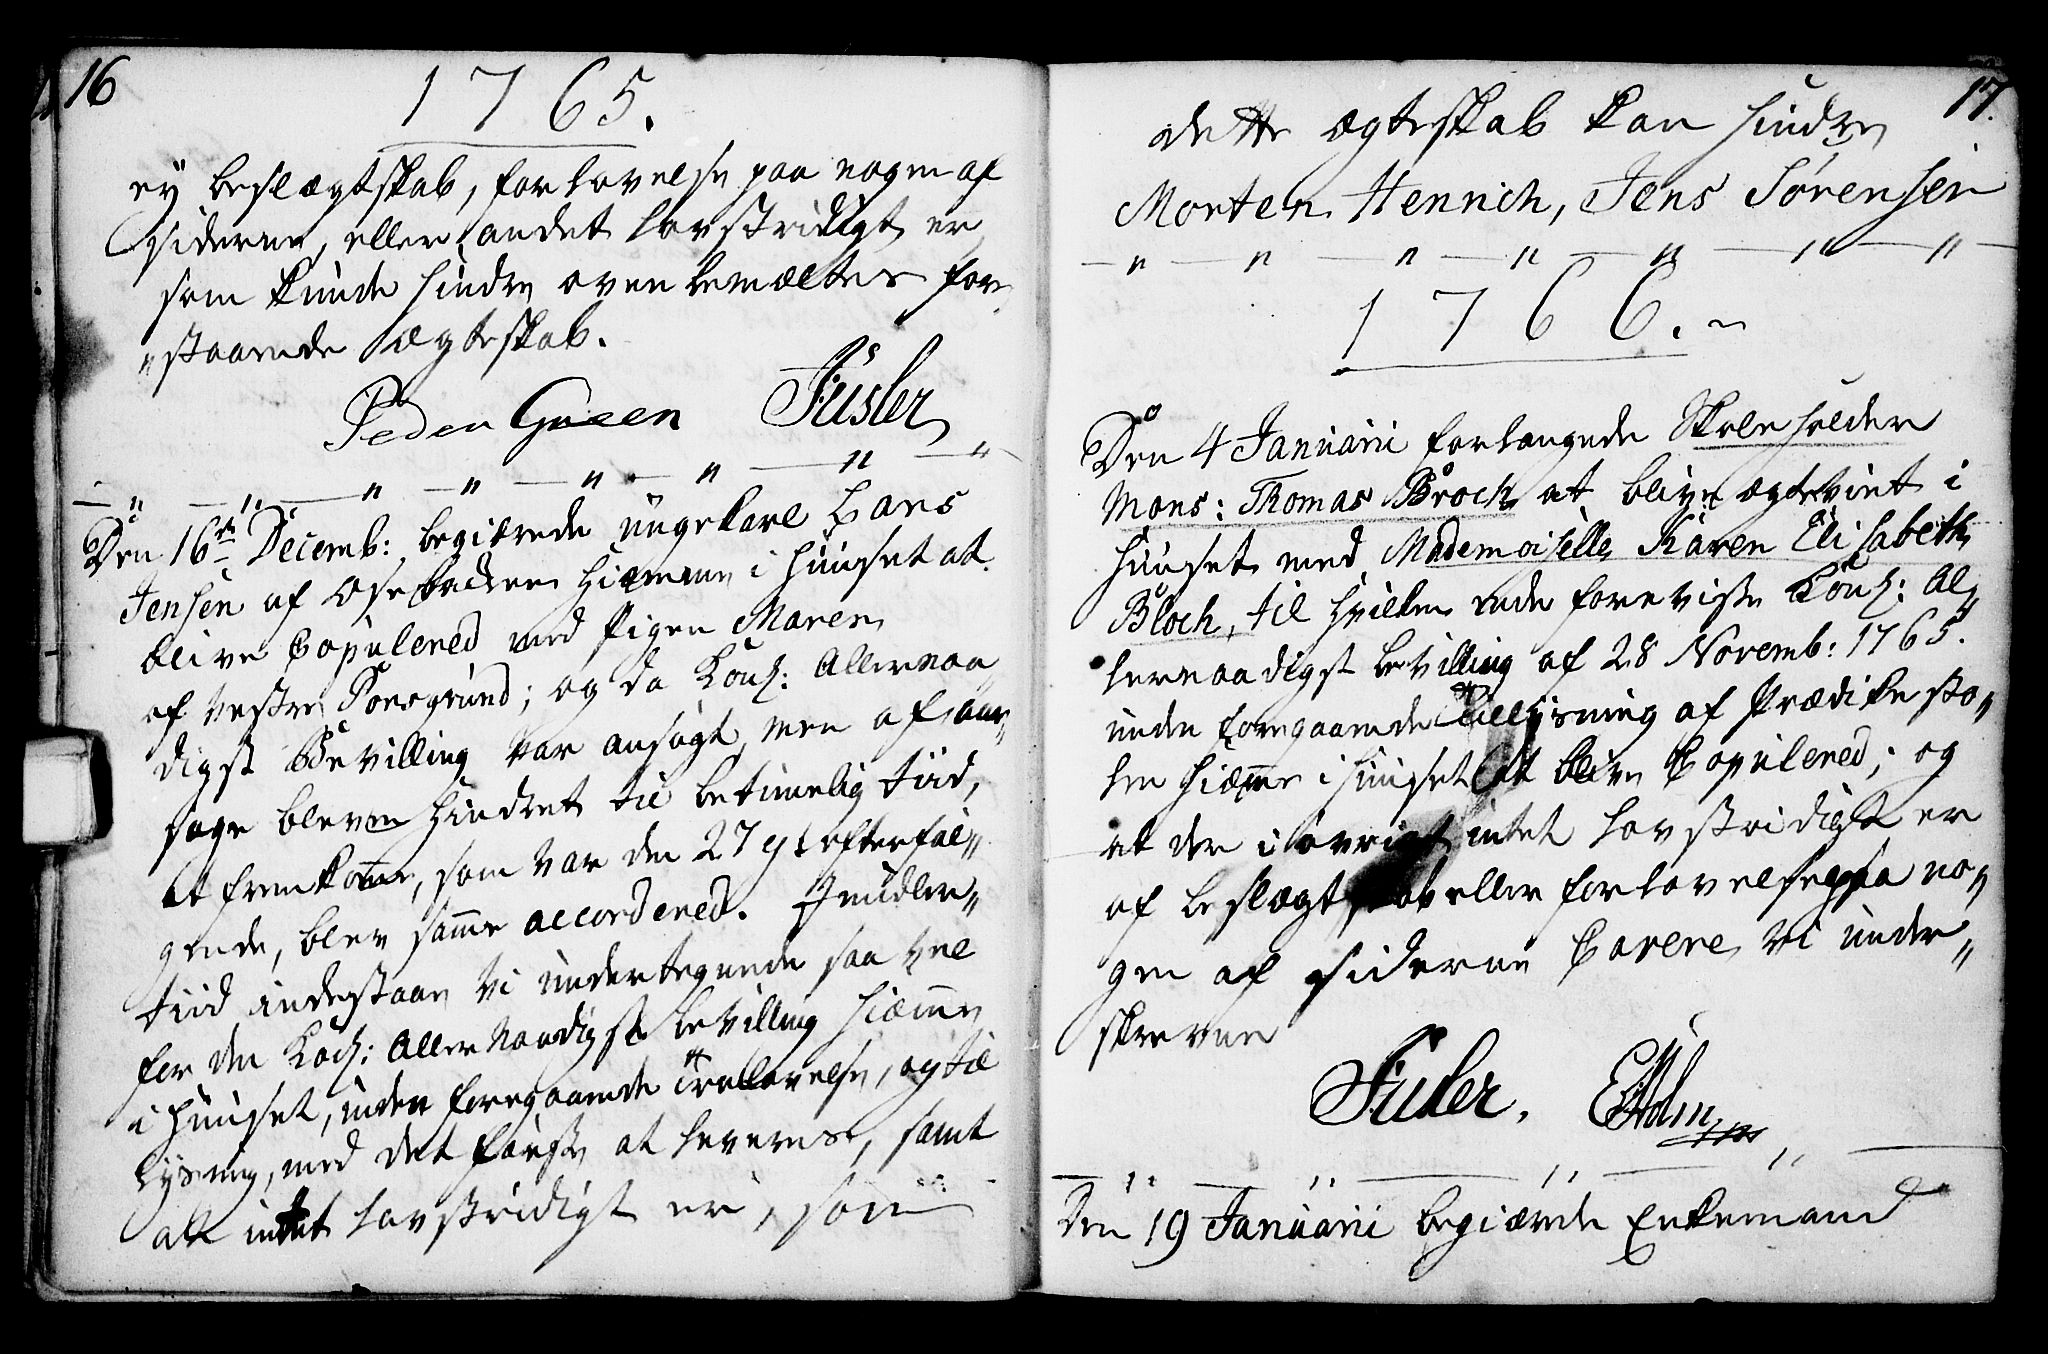 SAKO, Porsgrunn kirkebøker , F/Fa/L0003: Parish register (official) no. 3, 1764-1814, p. 16-17